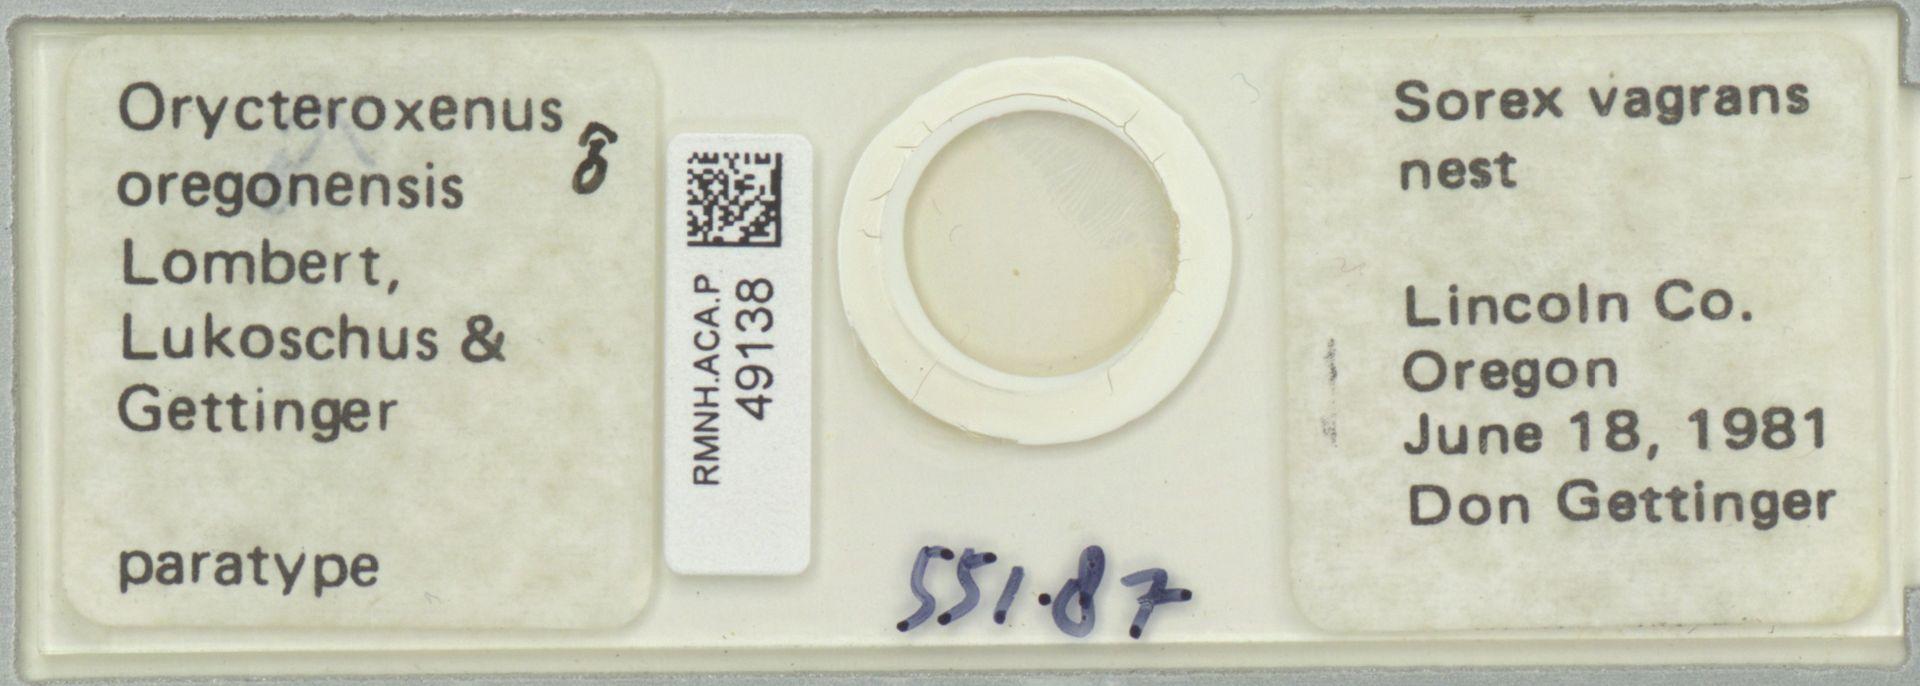 RMNH.ACA.P.49138 | Orycteroxenus oregonensis Lombert, Lukoschus & Gettinger